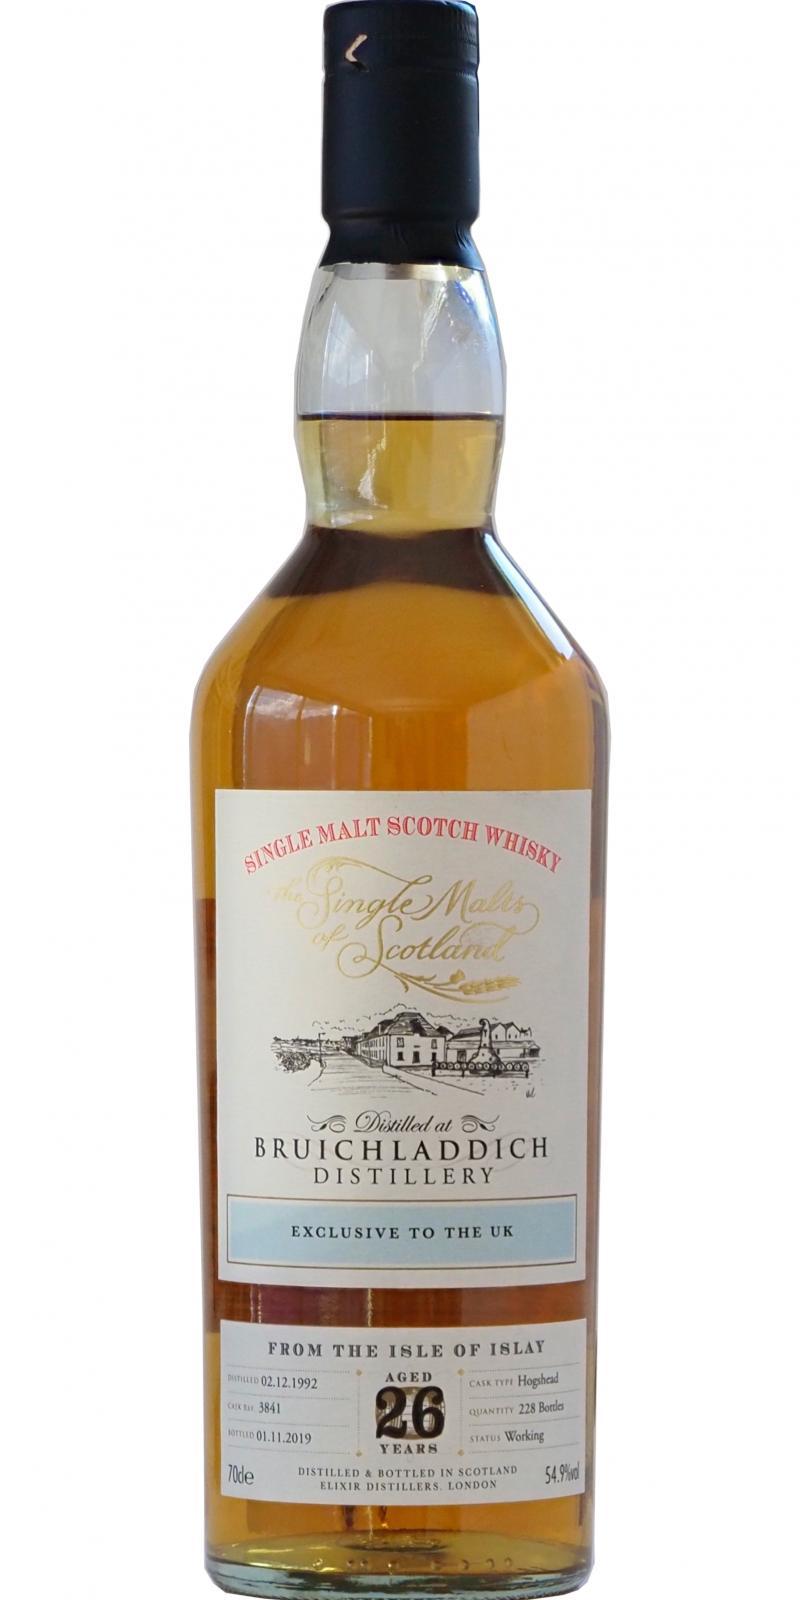 Bruichladdich 1992 ElD